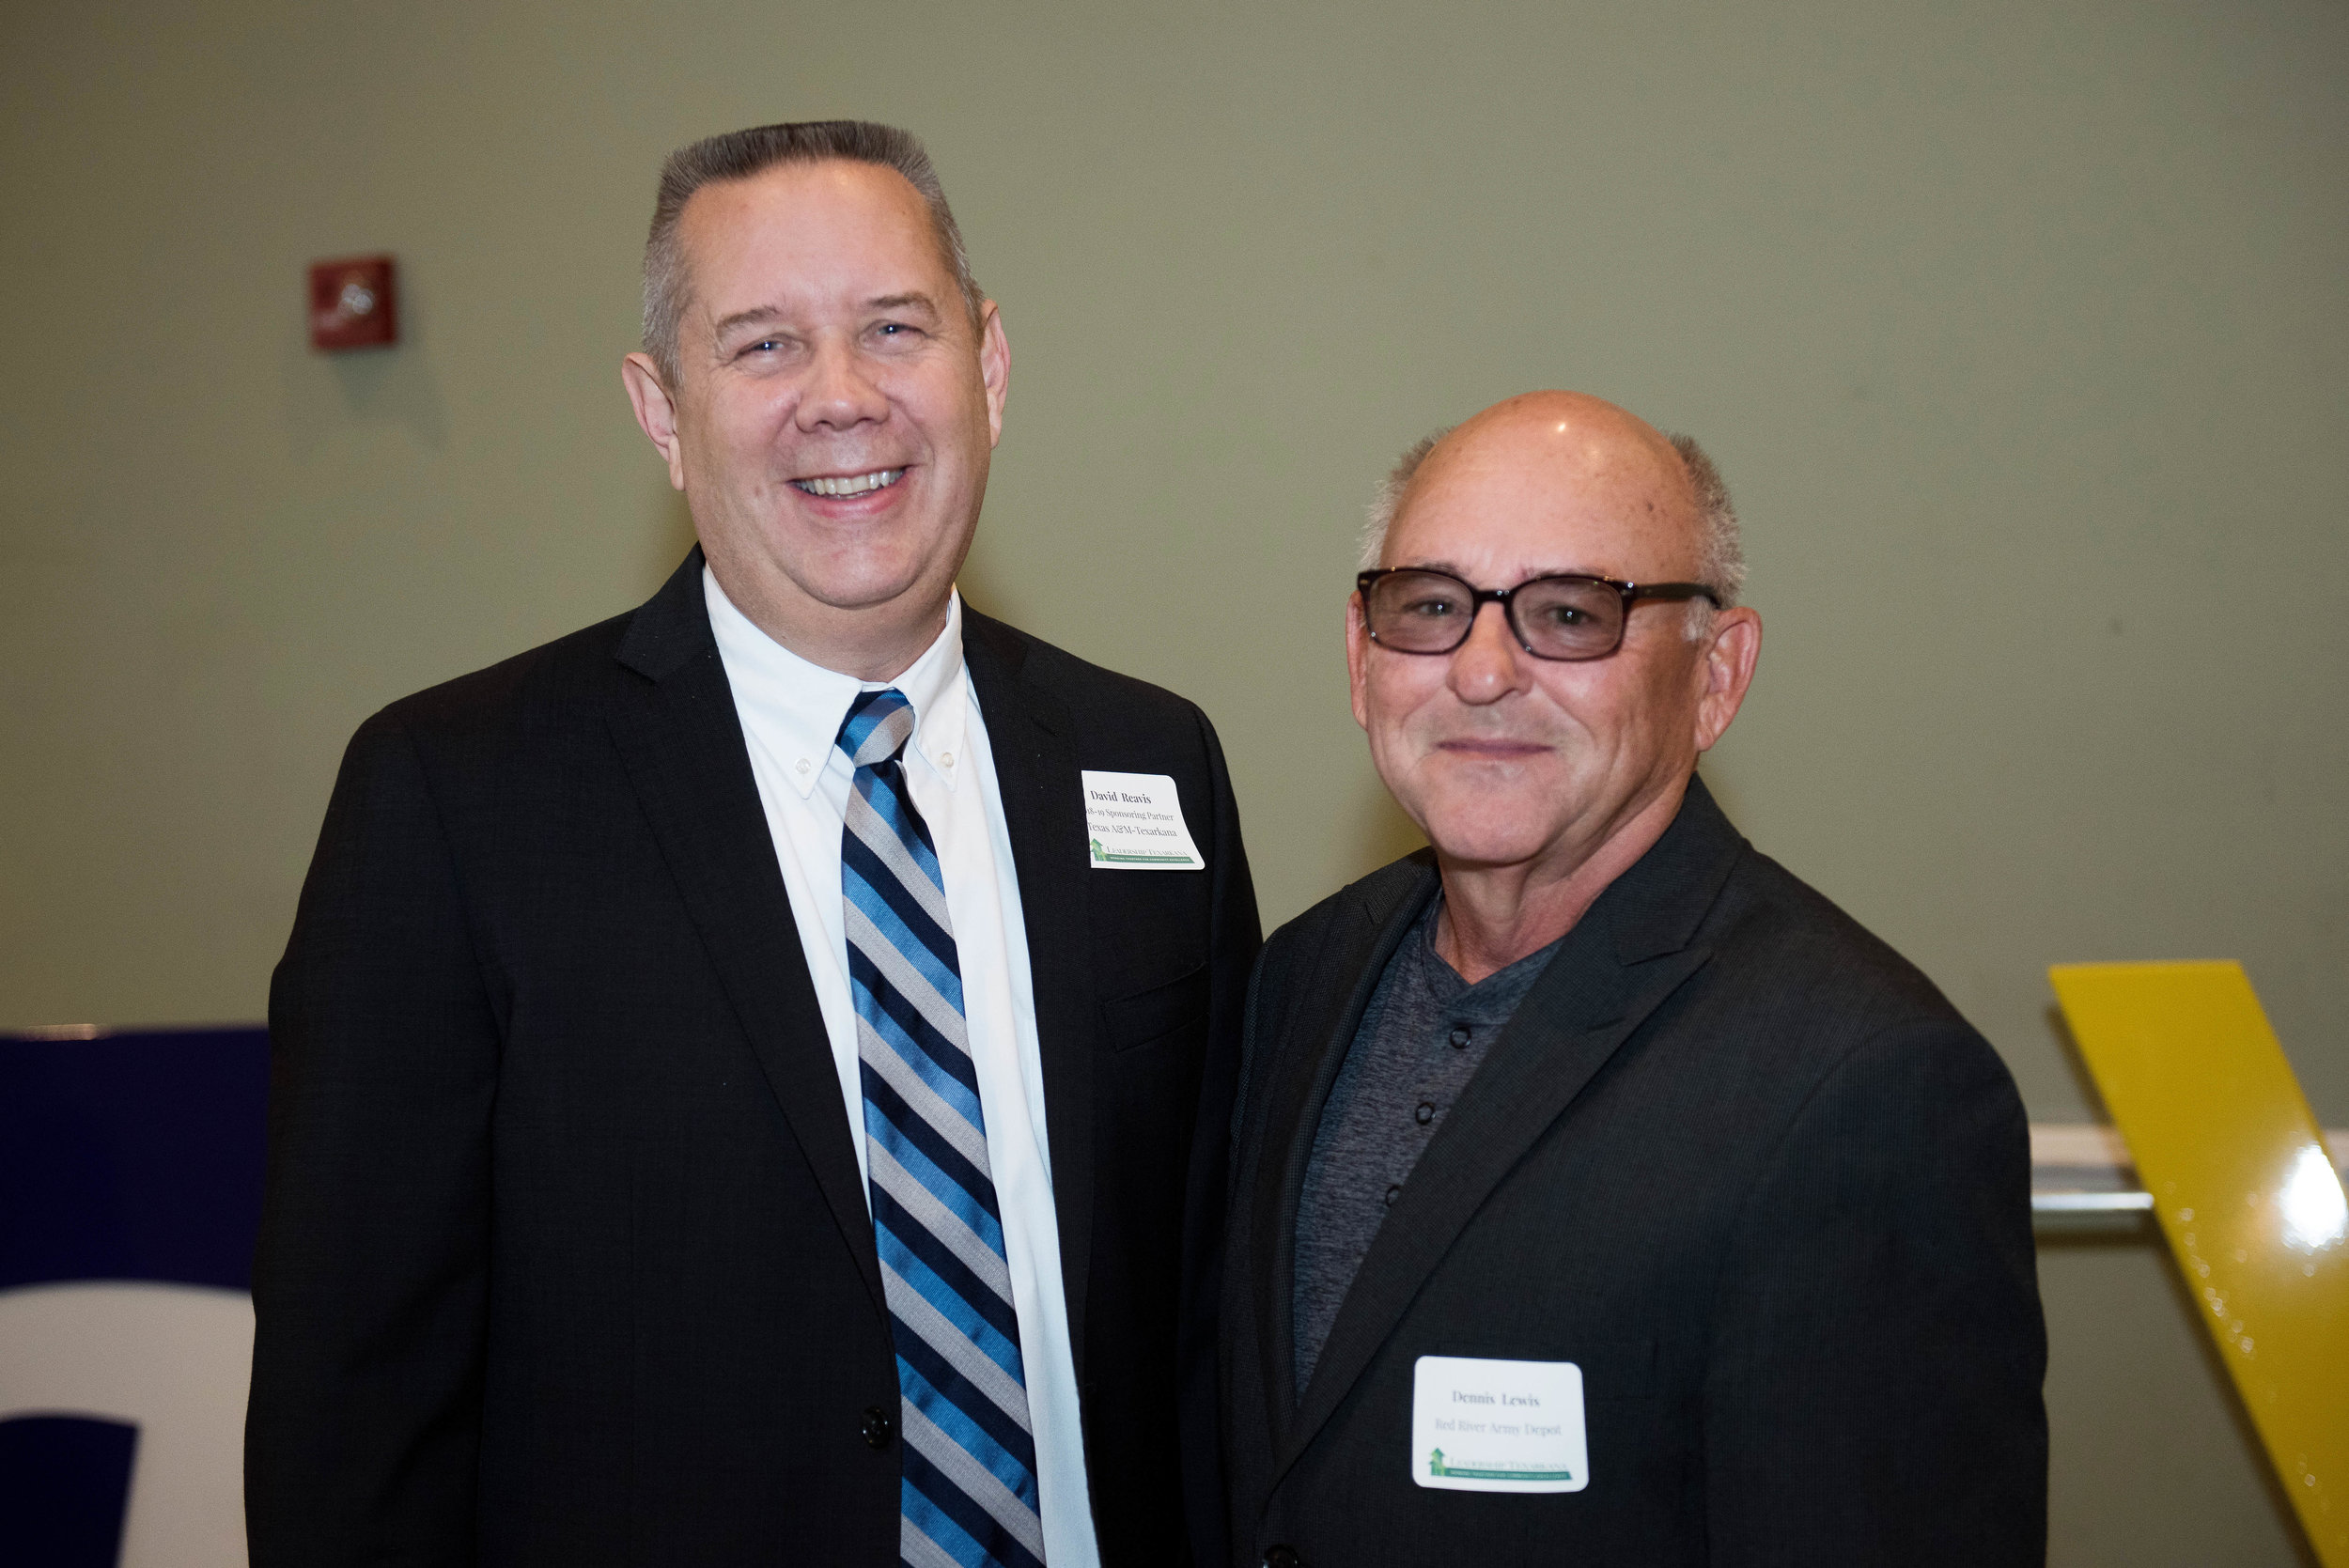 David Reavis and Dennis Lewis